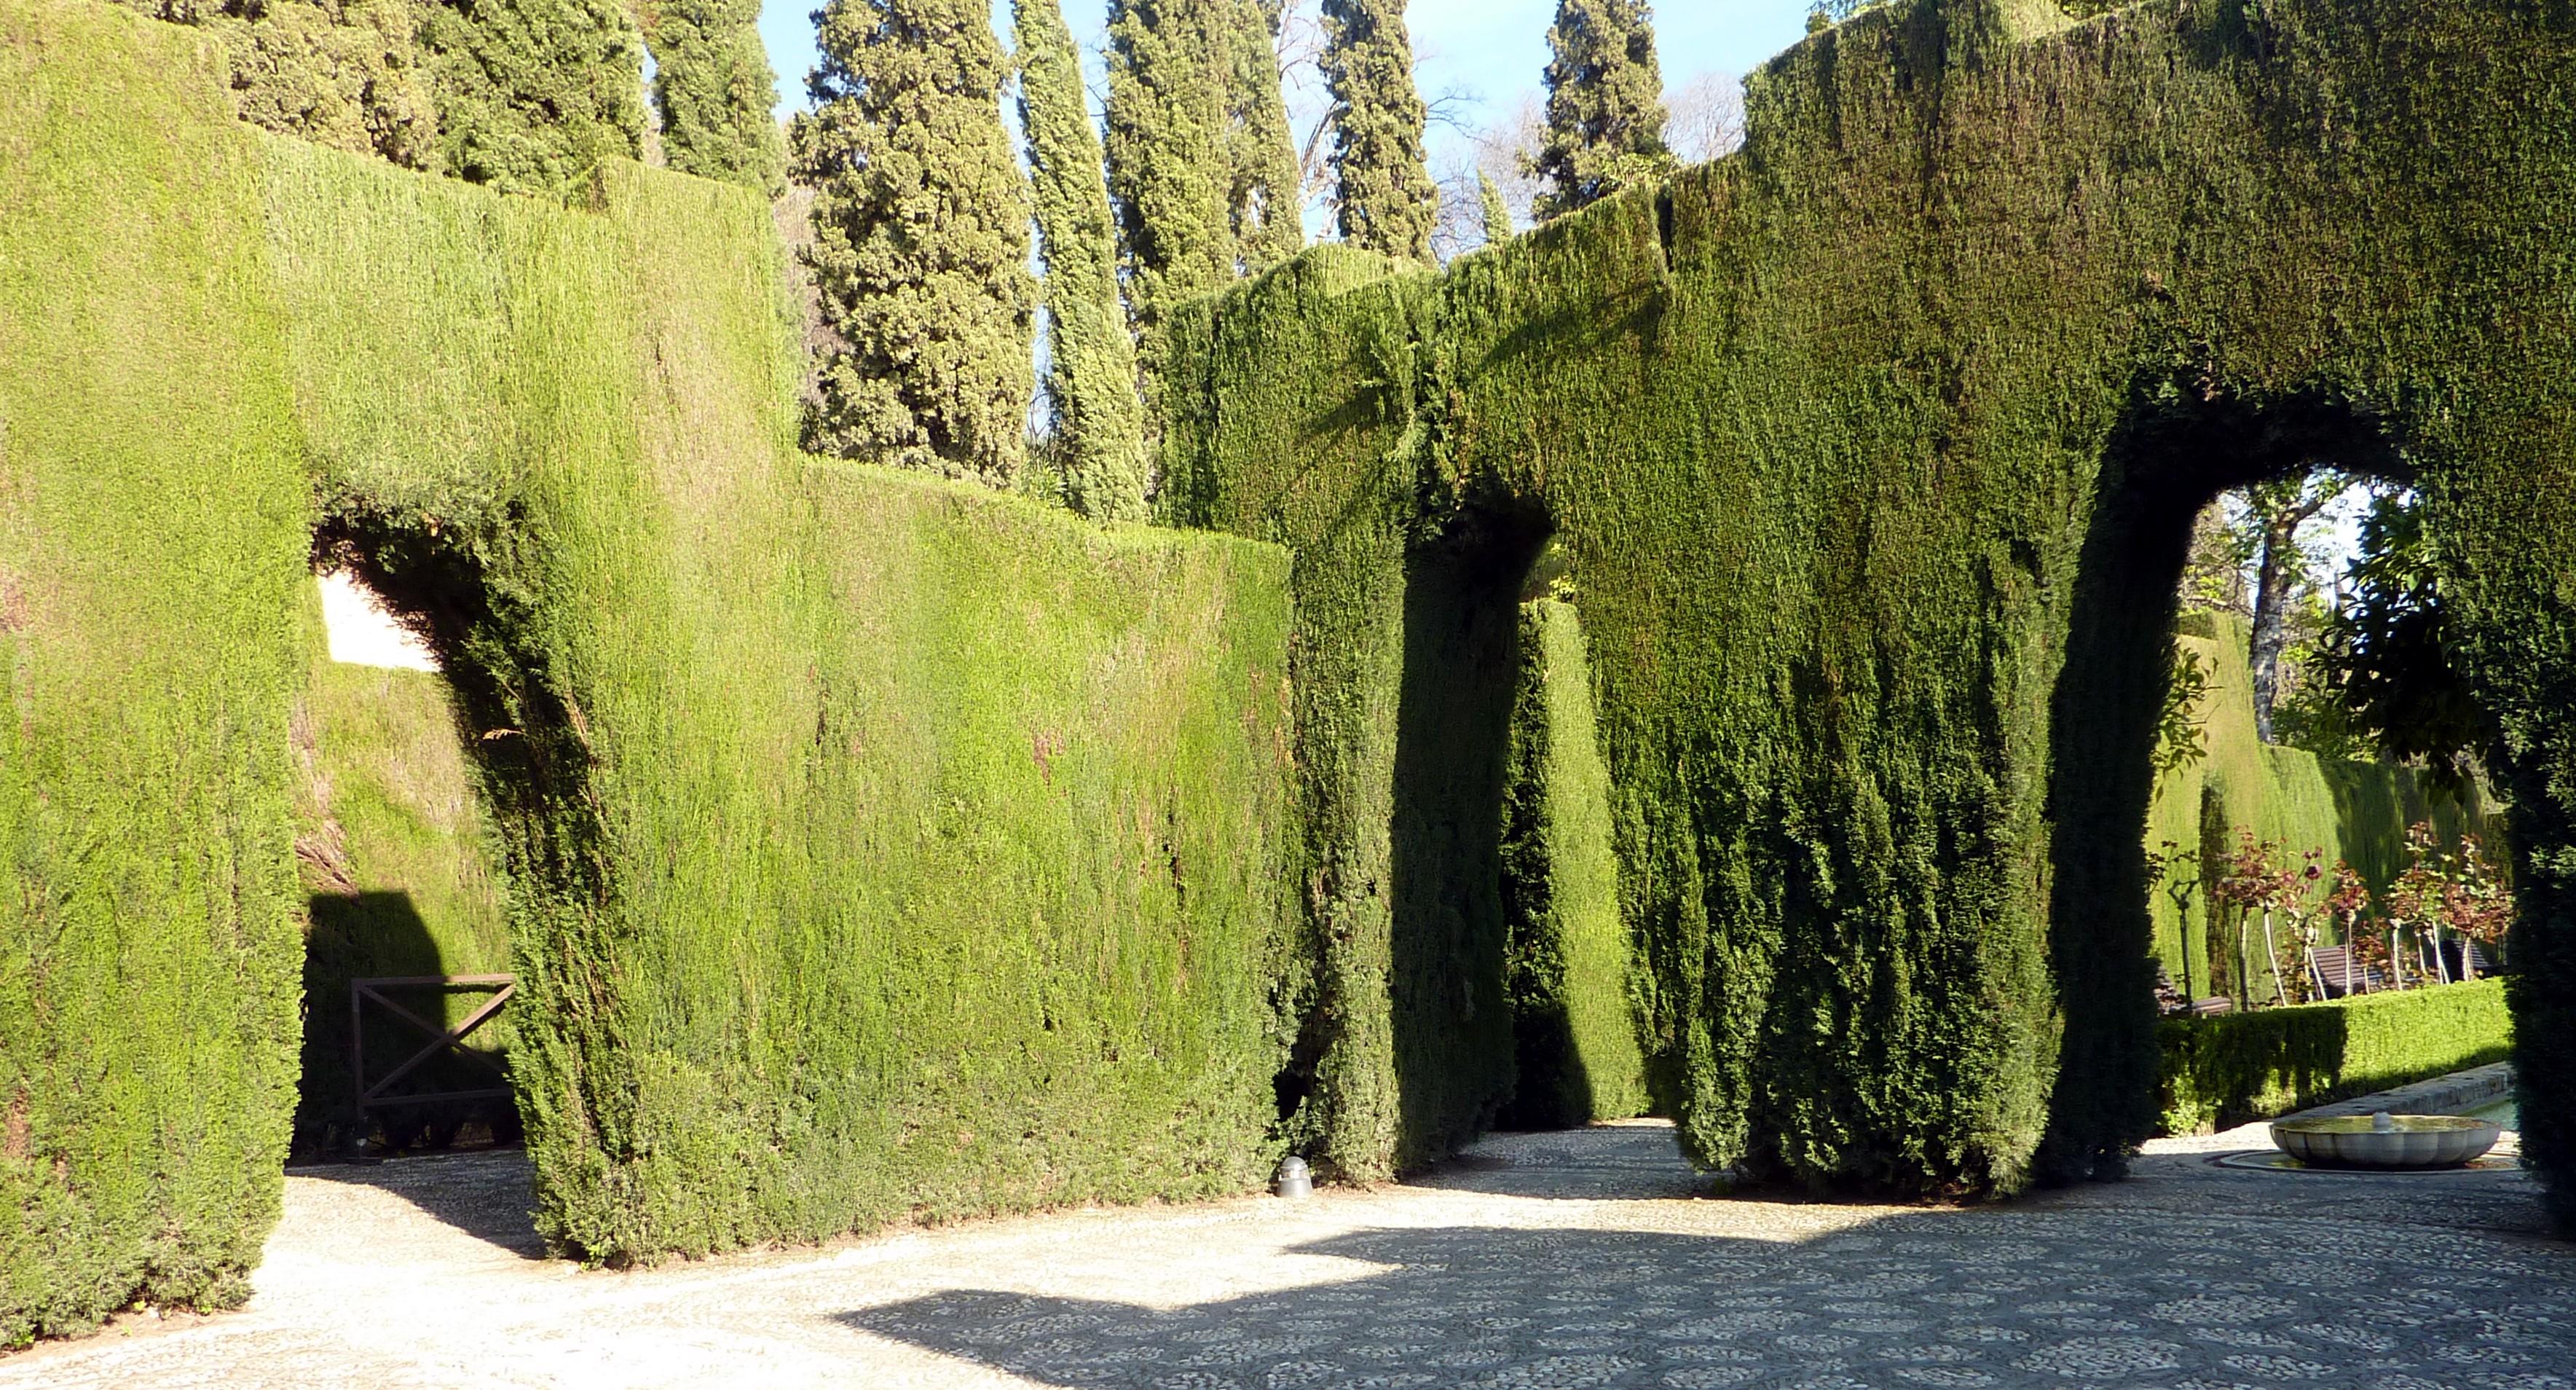 filejardn del generalife la alhambrajpg - Jardin De L Alhambra